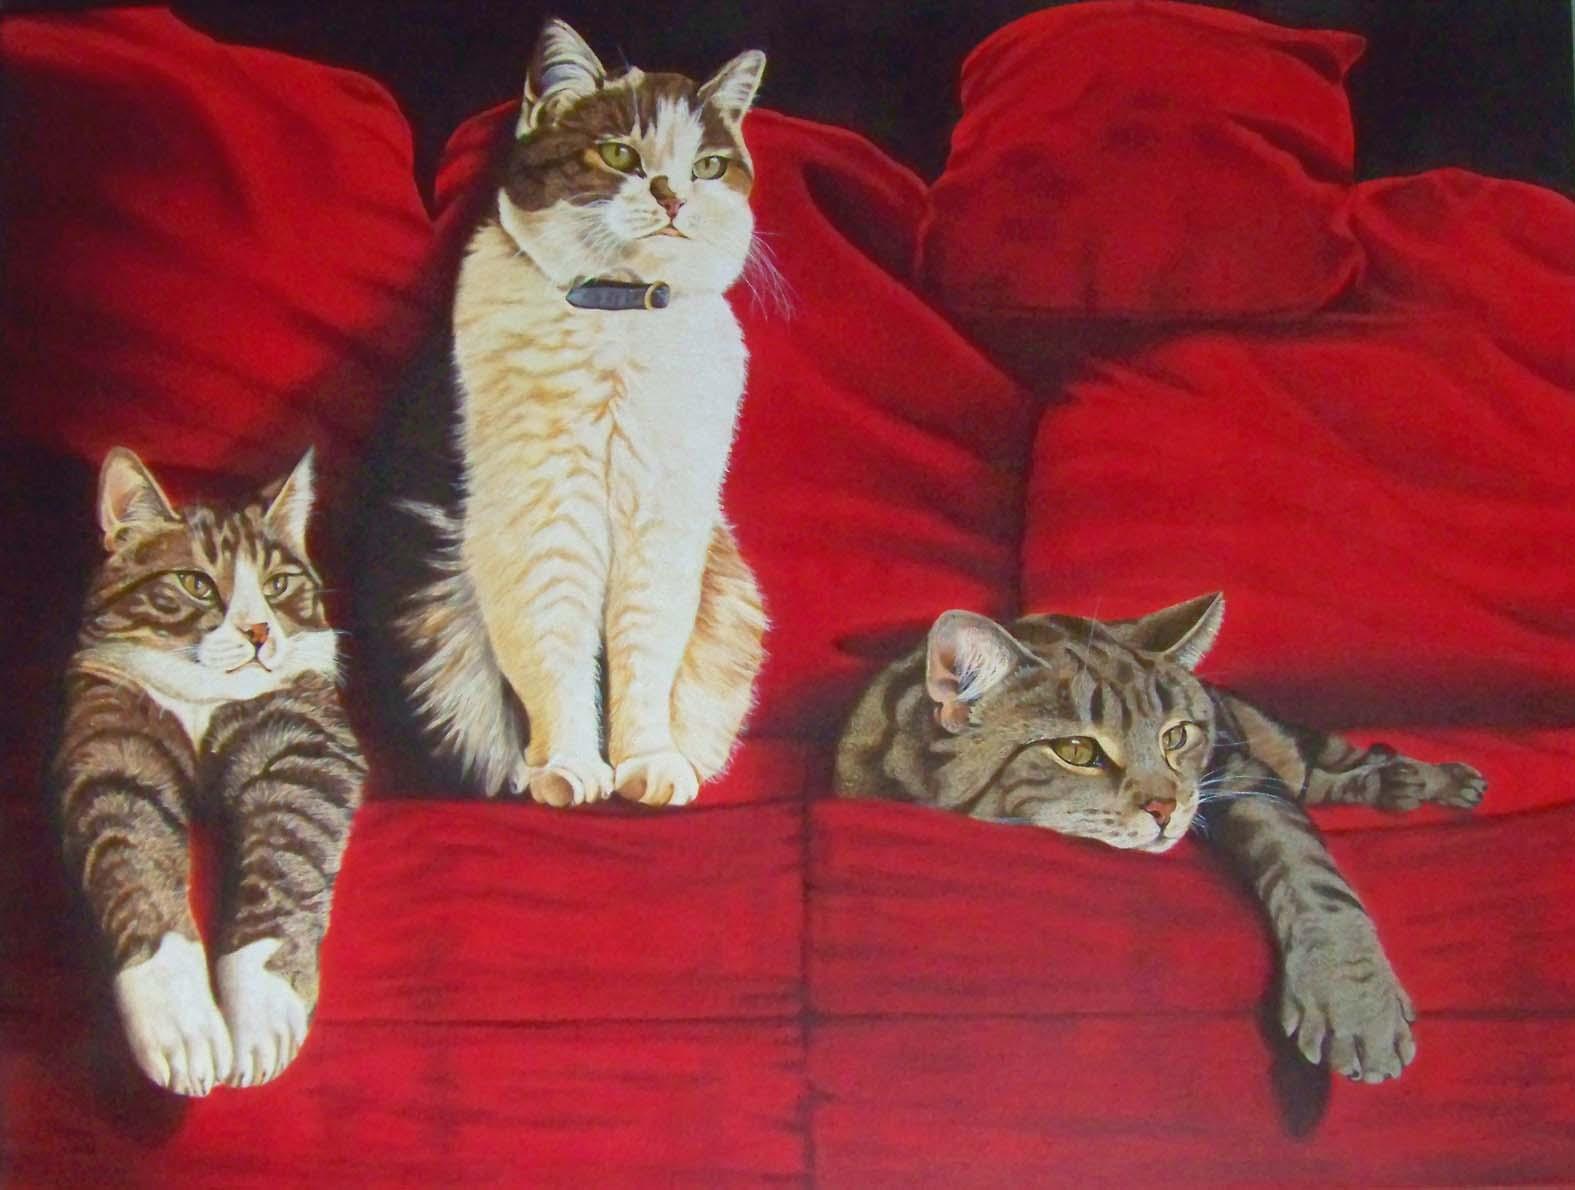 Bild Sofa Katzen Harz Lmalerei Entspannt Von Lillavarhelyi Bei Kunstnet